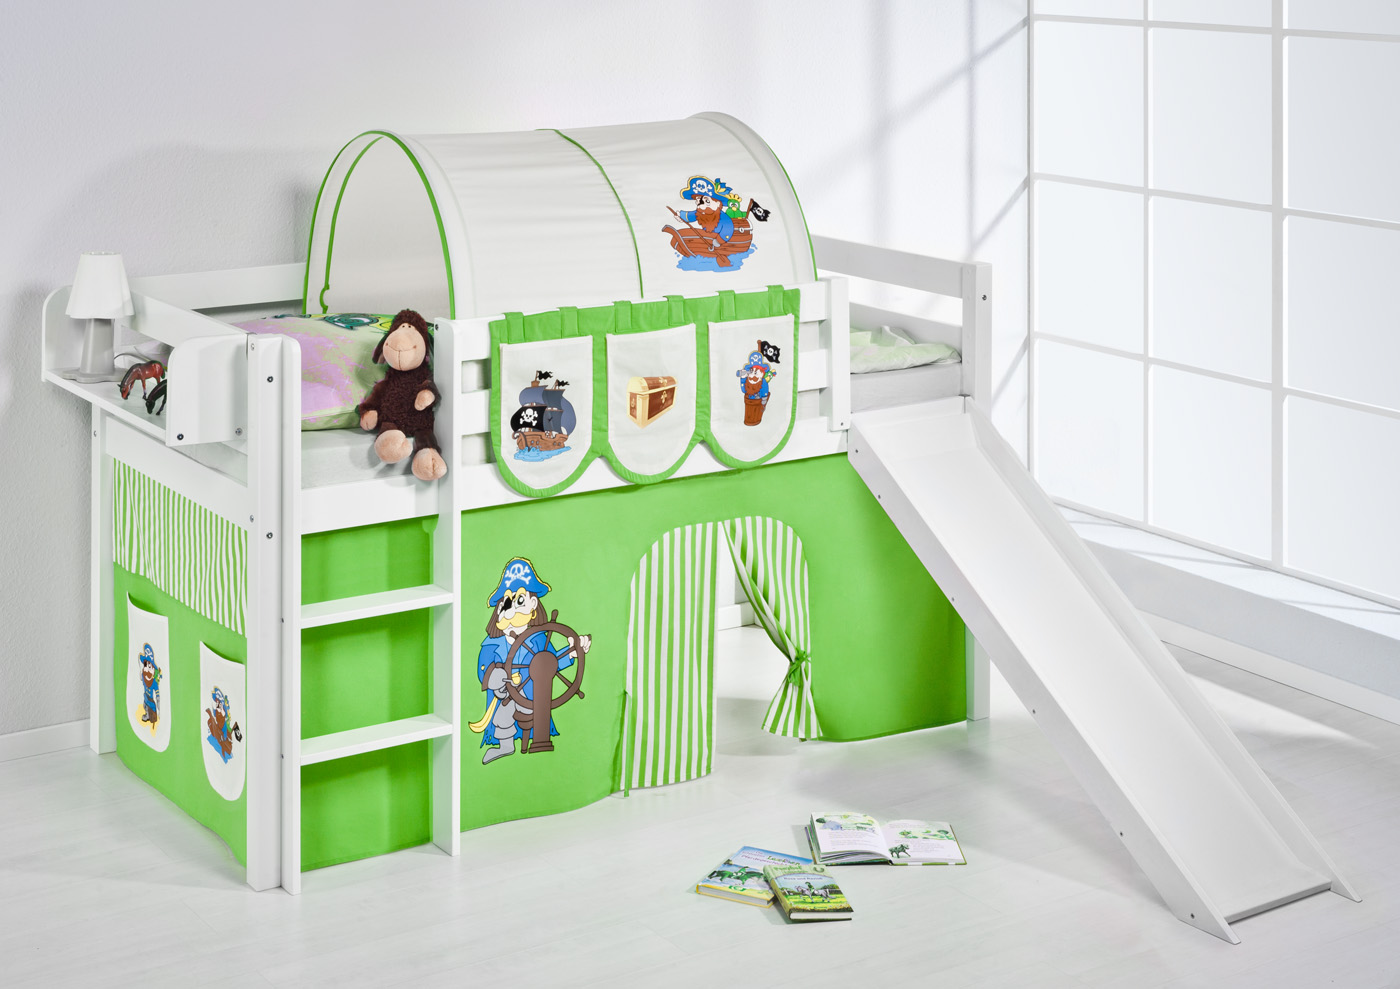 spielbett hochbett kinderbett jelle 190x90 weiss mit rutsche lilokids ebay. Black Bedroom Furniture Sets. Home Design Ideas